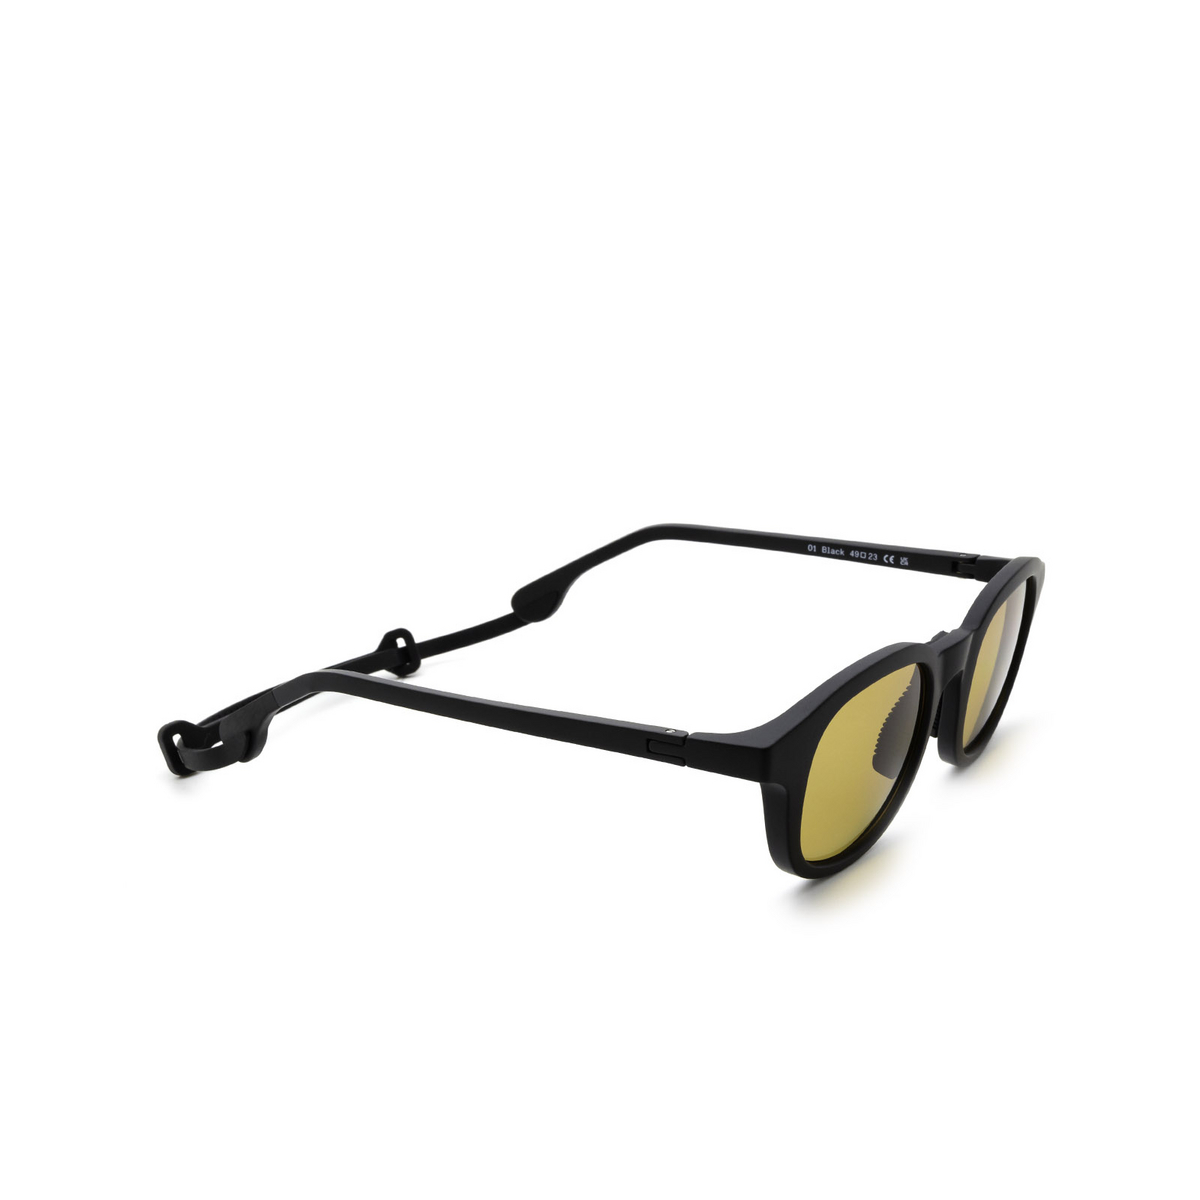 Chimi® Square Sunglasses: 01 ACTIVE color Black - three-quarters view.